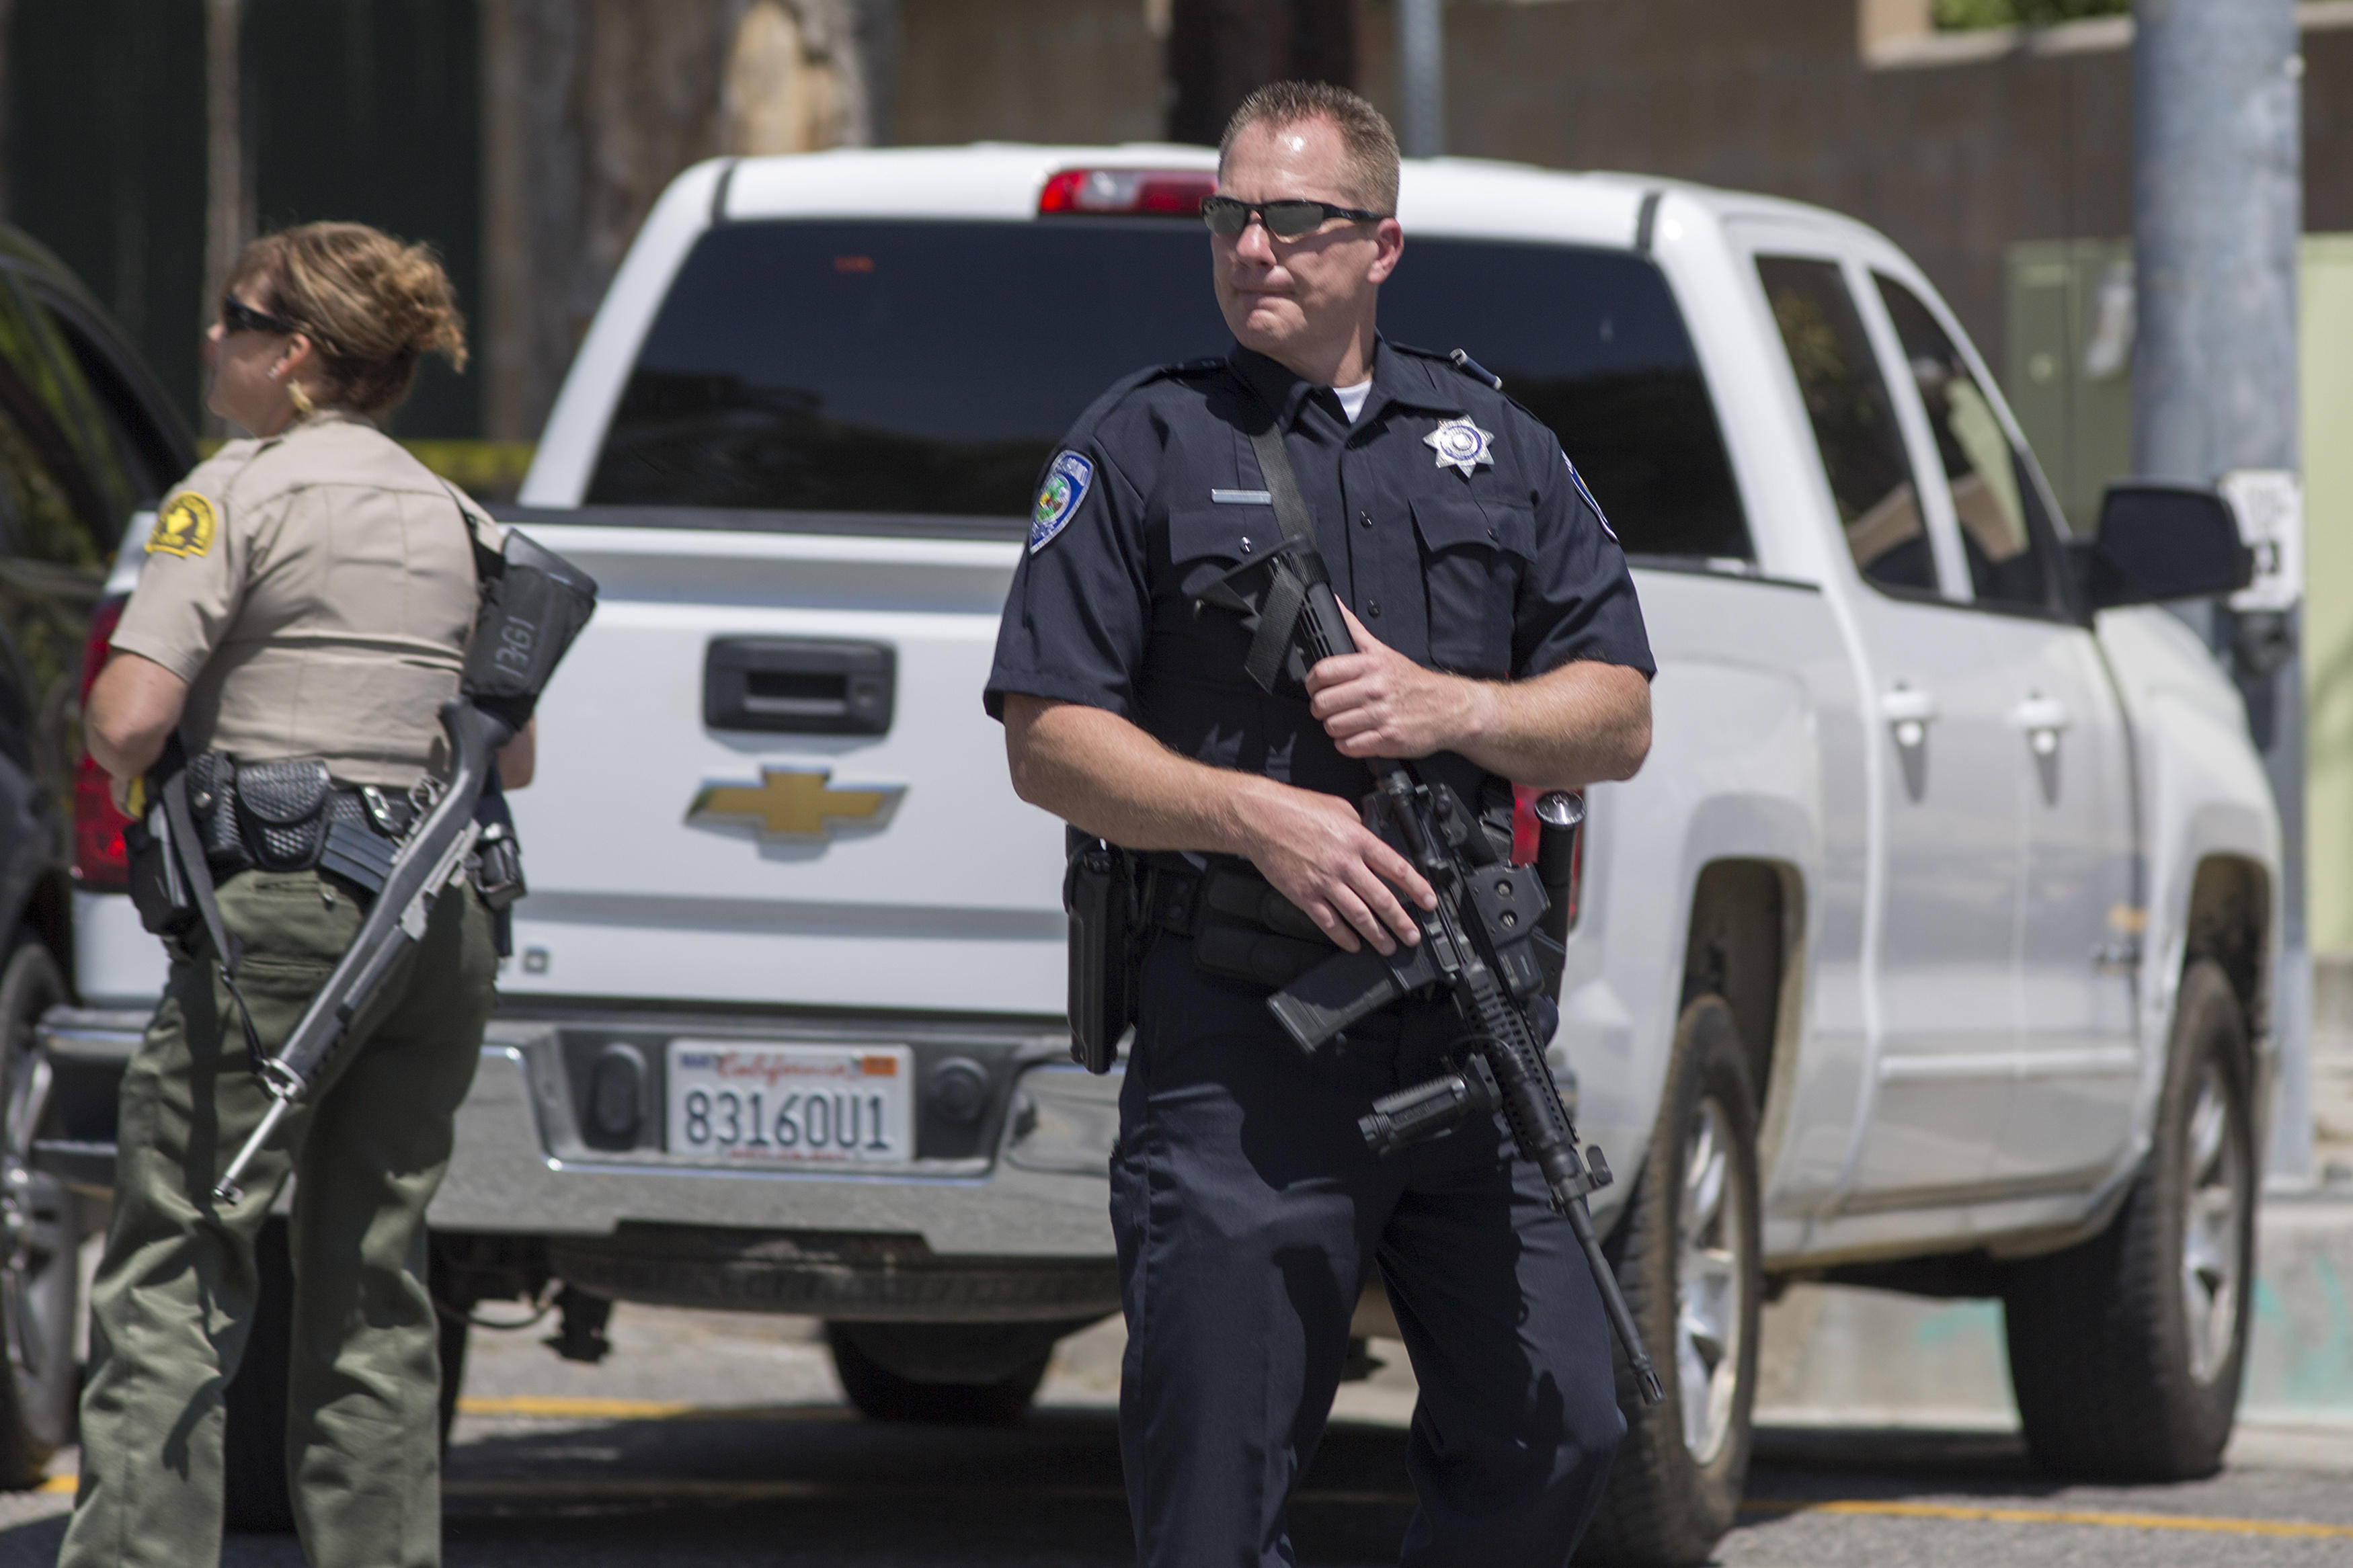 San Bernardino: 3 dead in North Park Elementary School